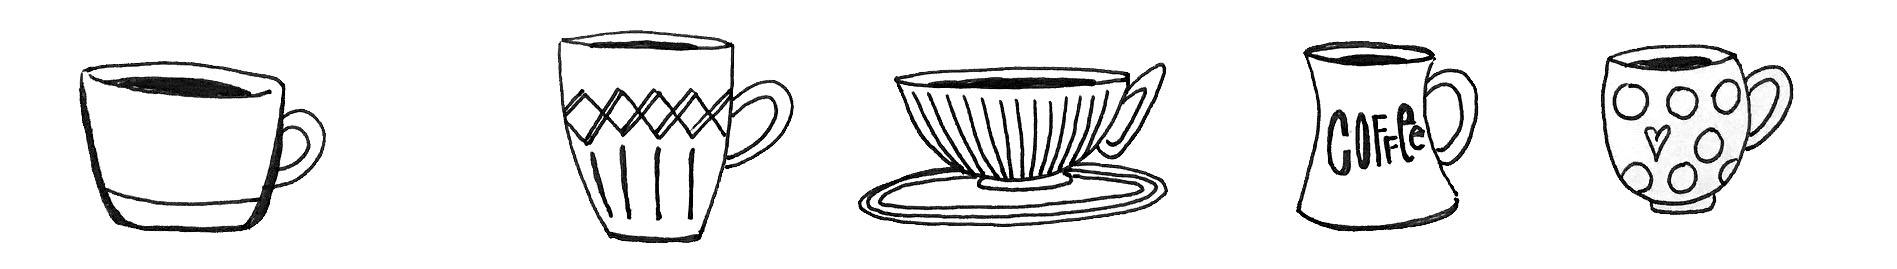 cups04.jpg